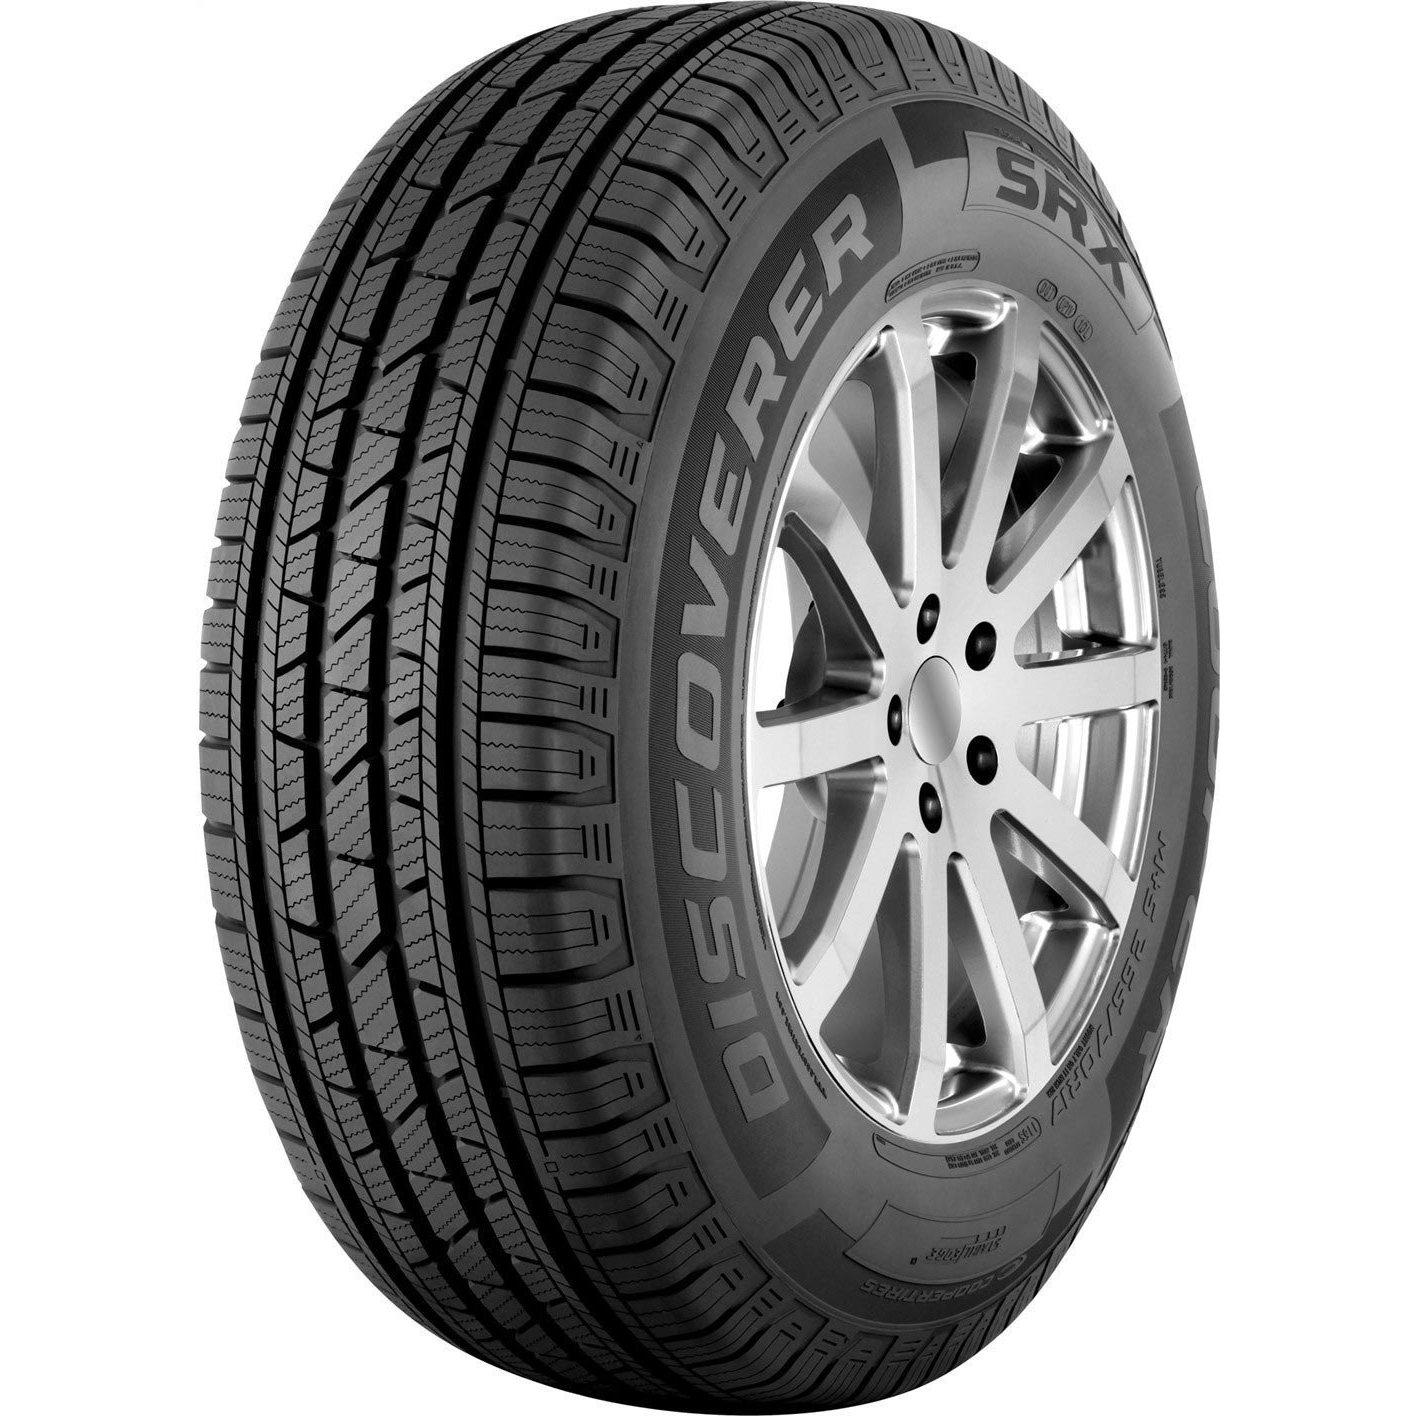 COOPER Discoverer SRX All Season Tire - 235/65R18 106T (B...